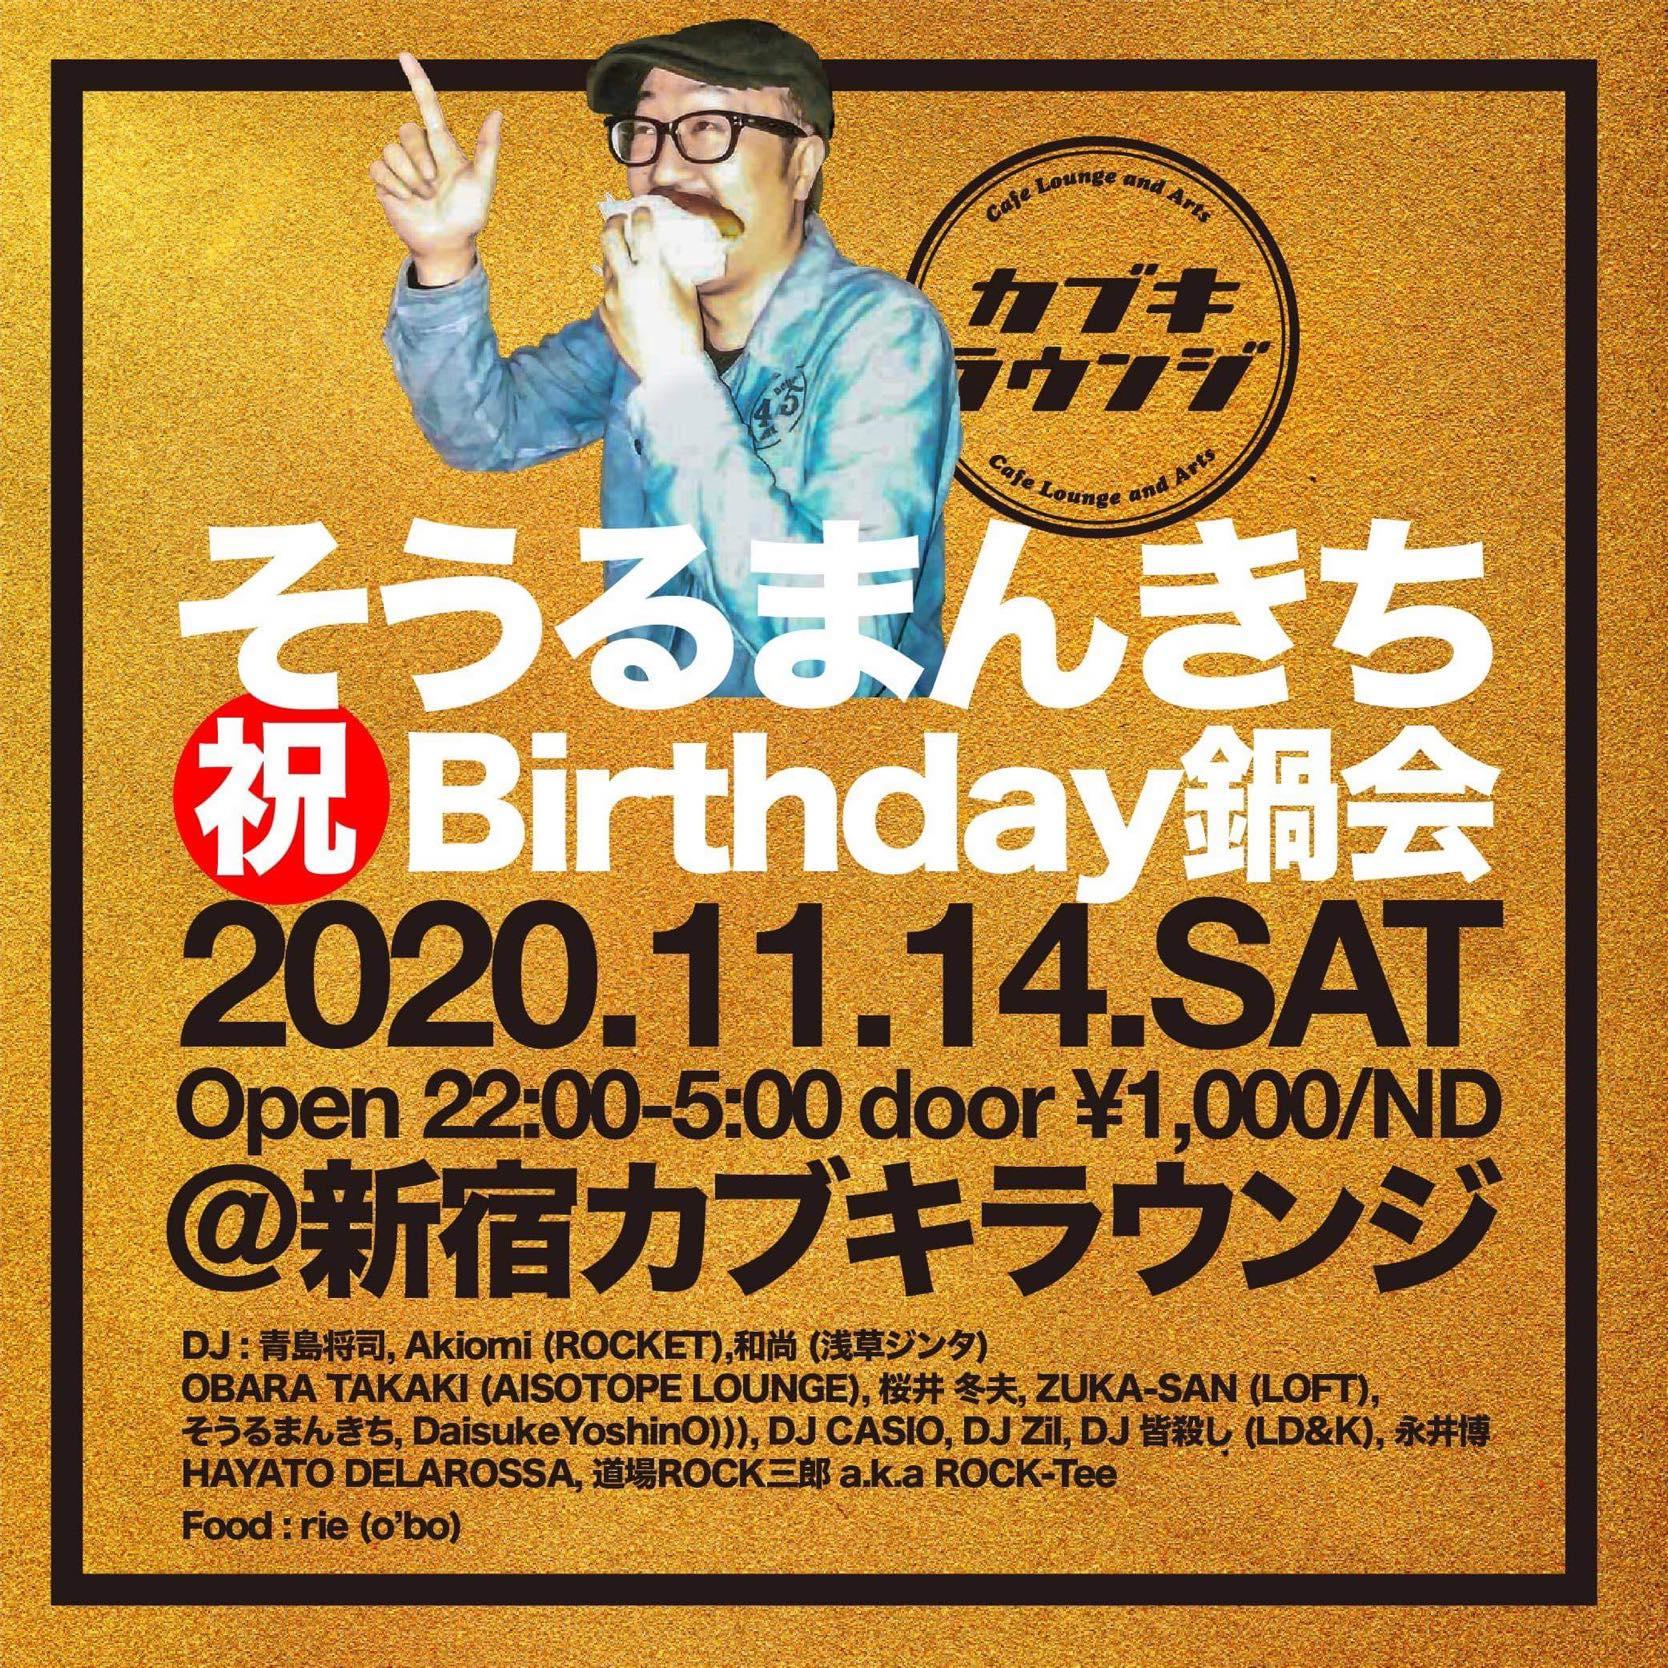 2020.11/14 sat そうるまんきちBirthday鍋会